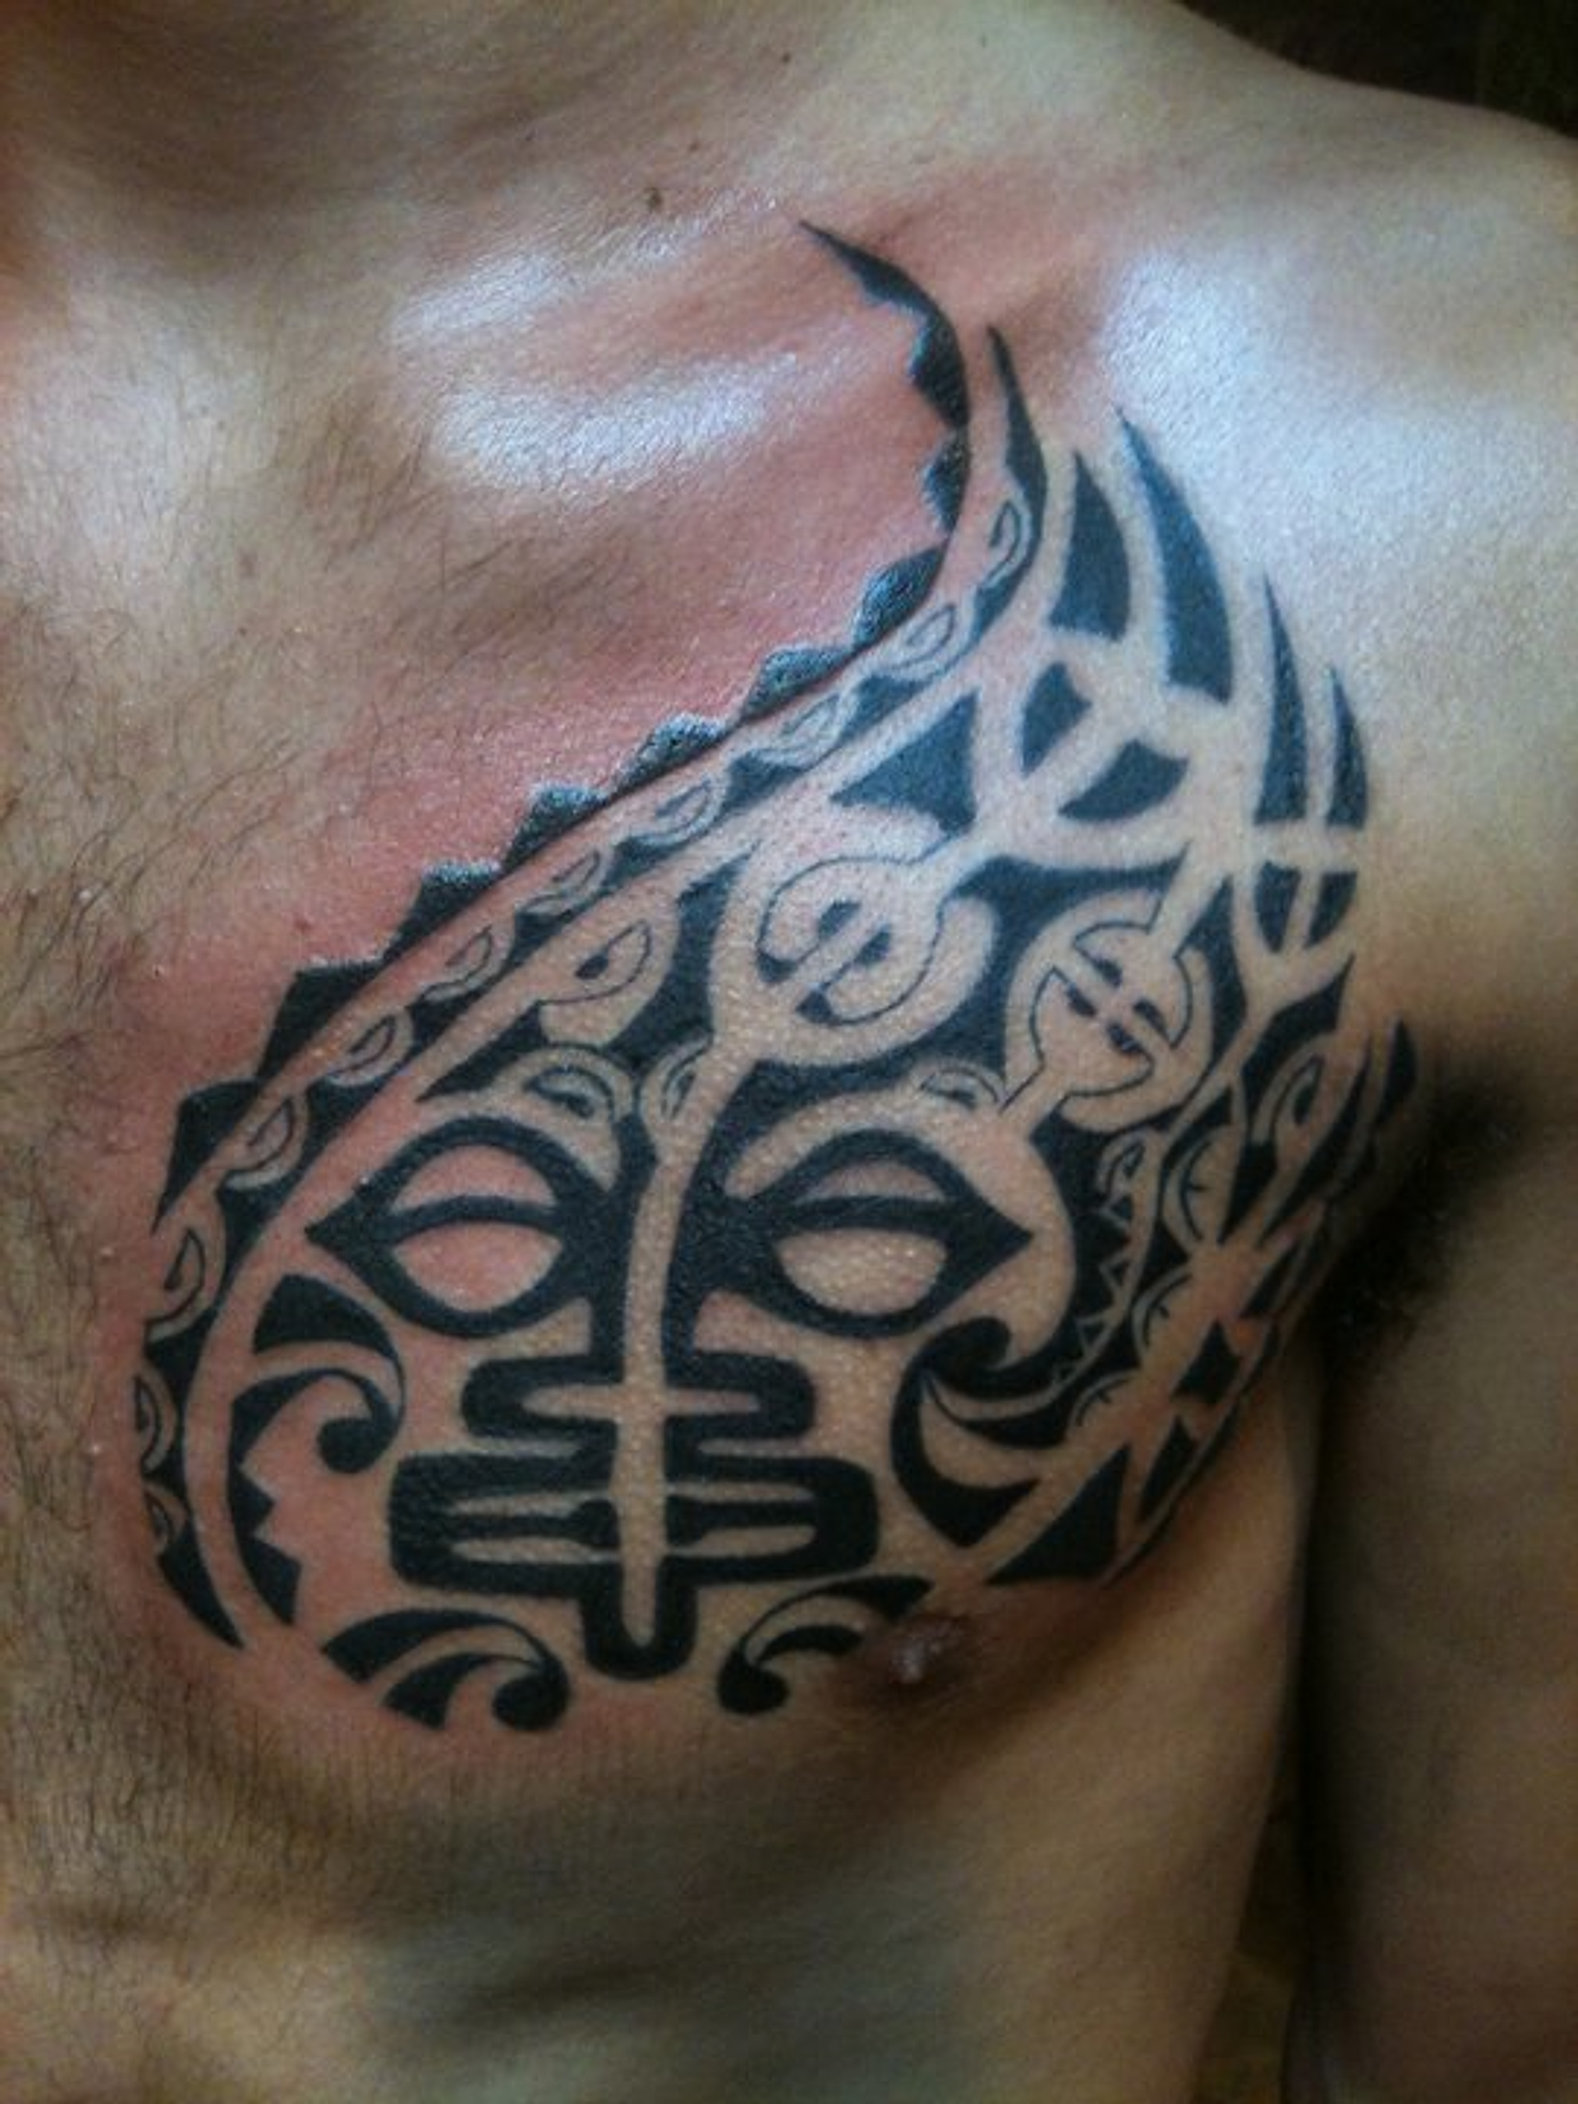 Hotrodtattoo leilani parker tattoo artist for Scottsdale harley davidson tattoo